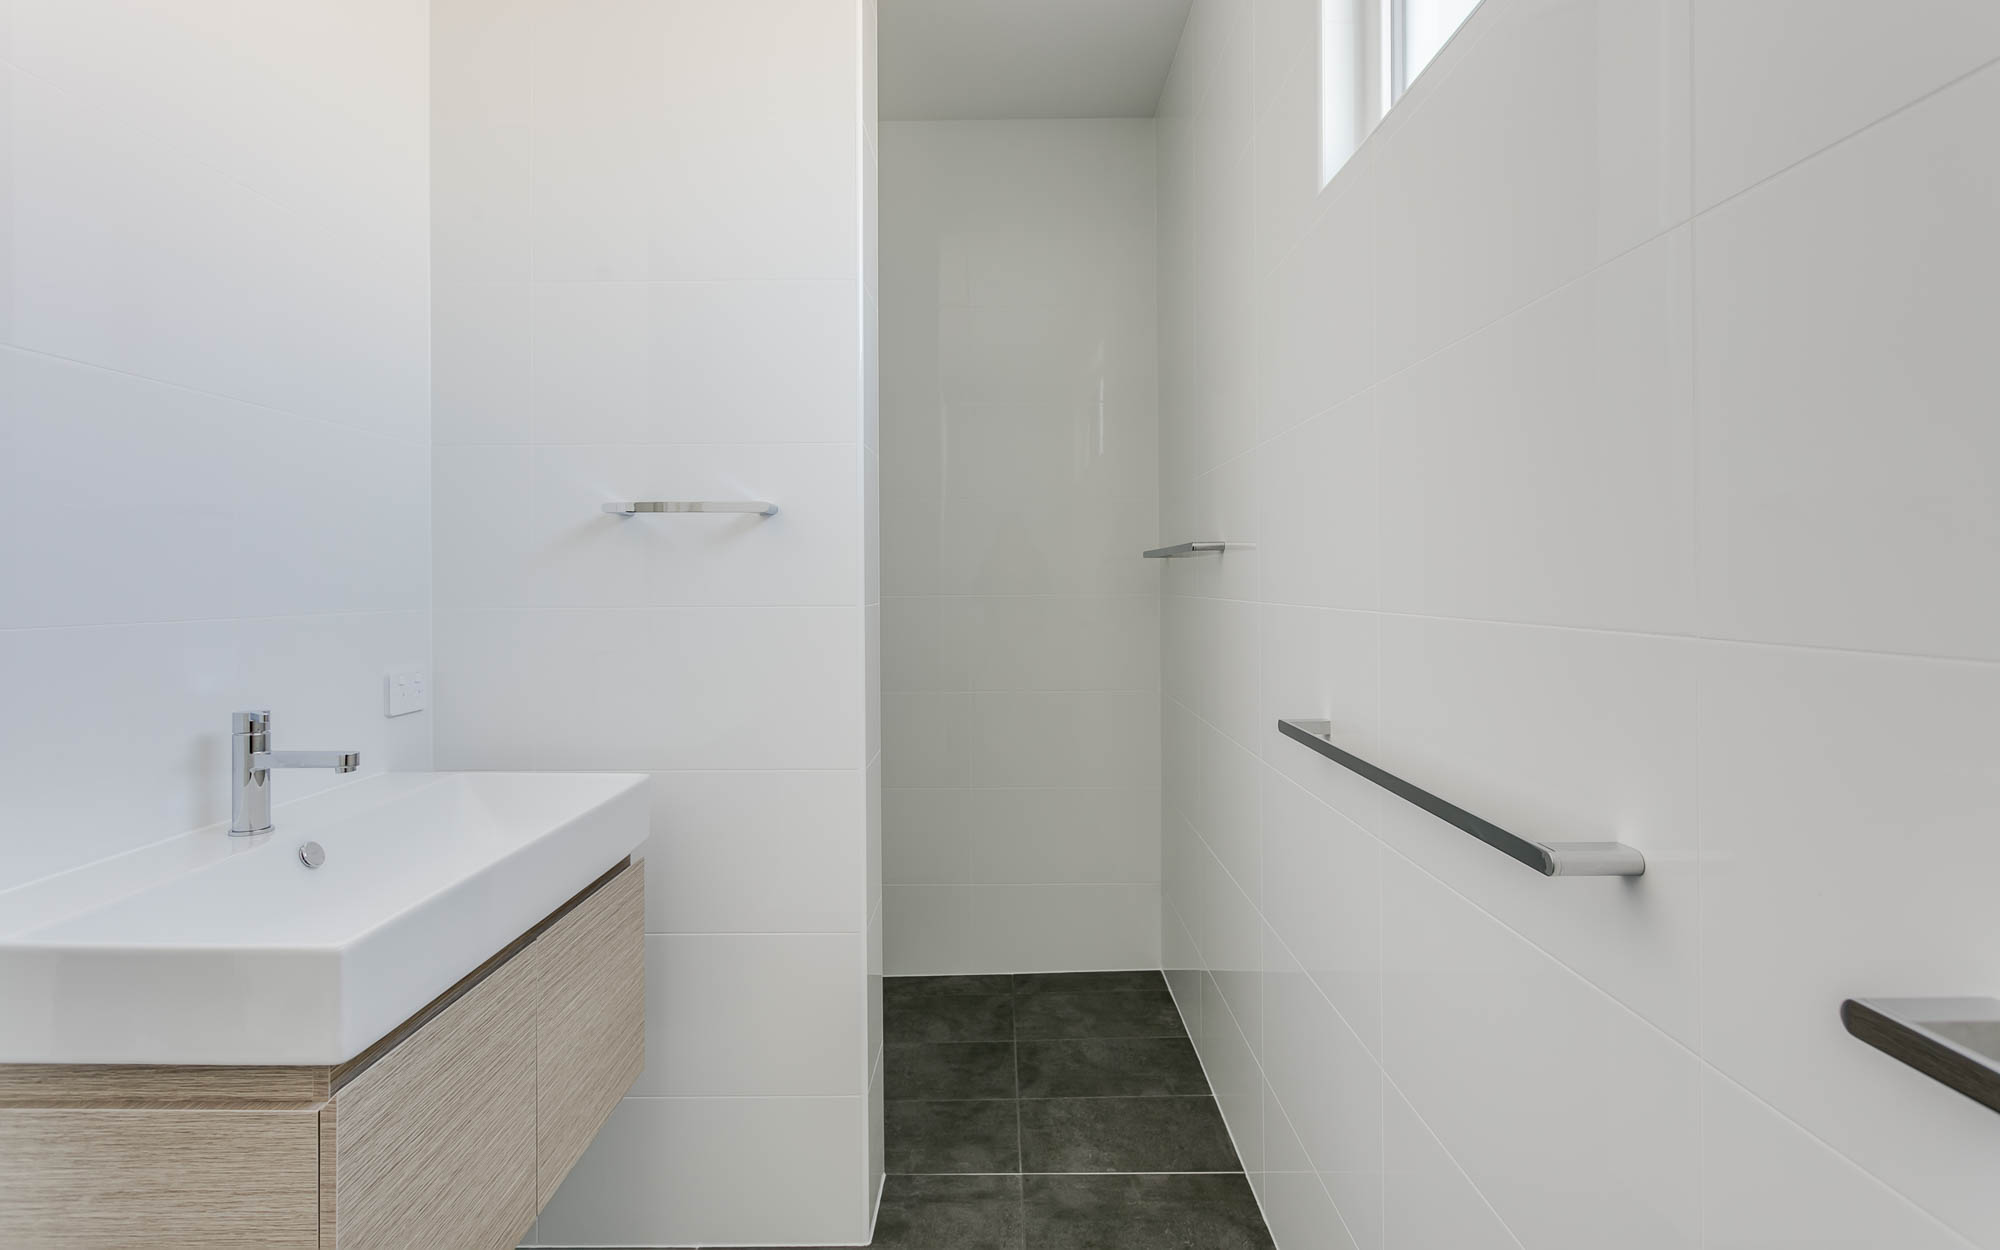 New Victor Harbor bathroom by Granite Homes